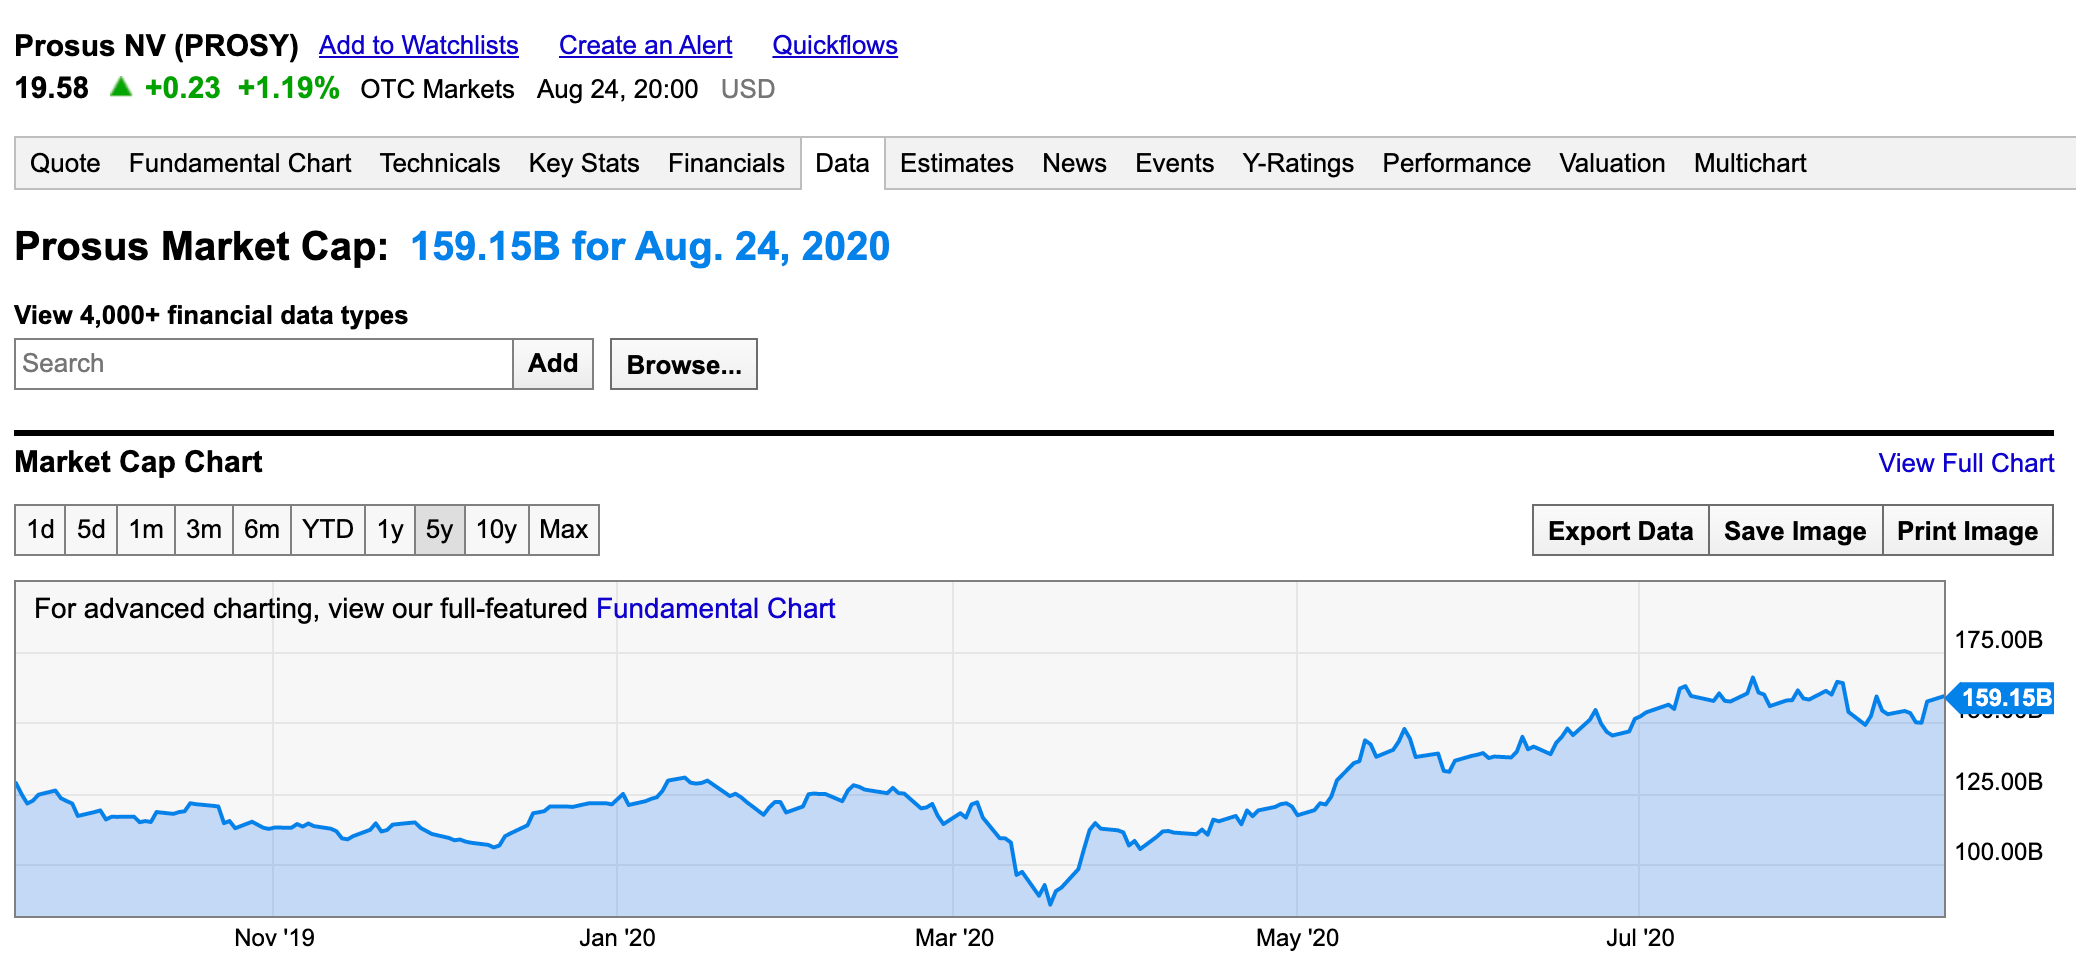 Prosus Market Cap, ycharts